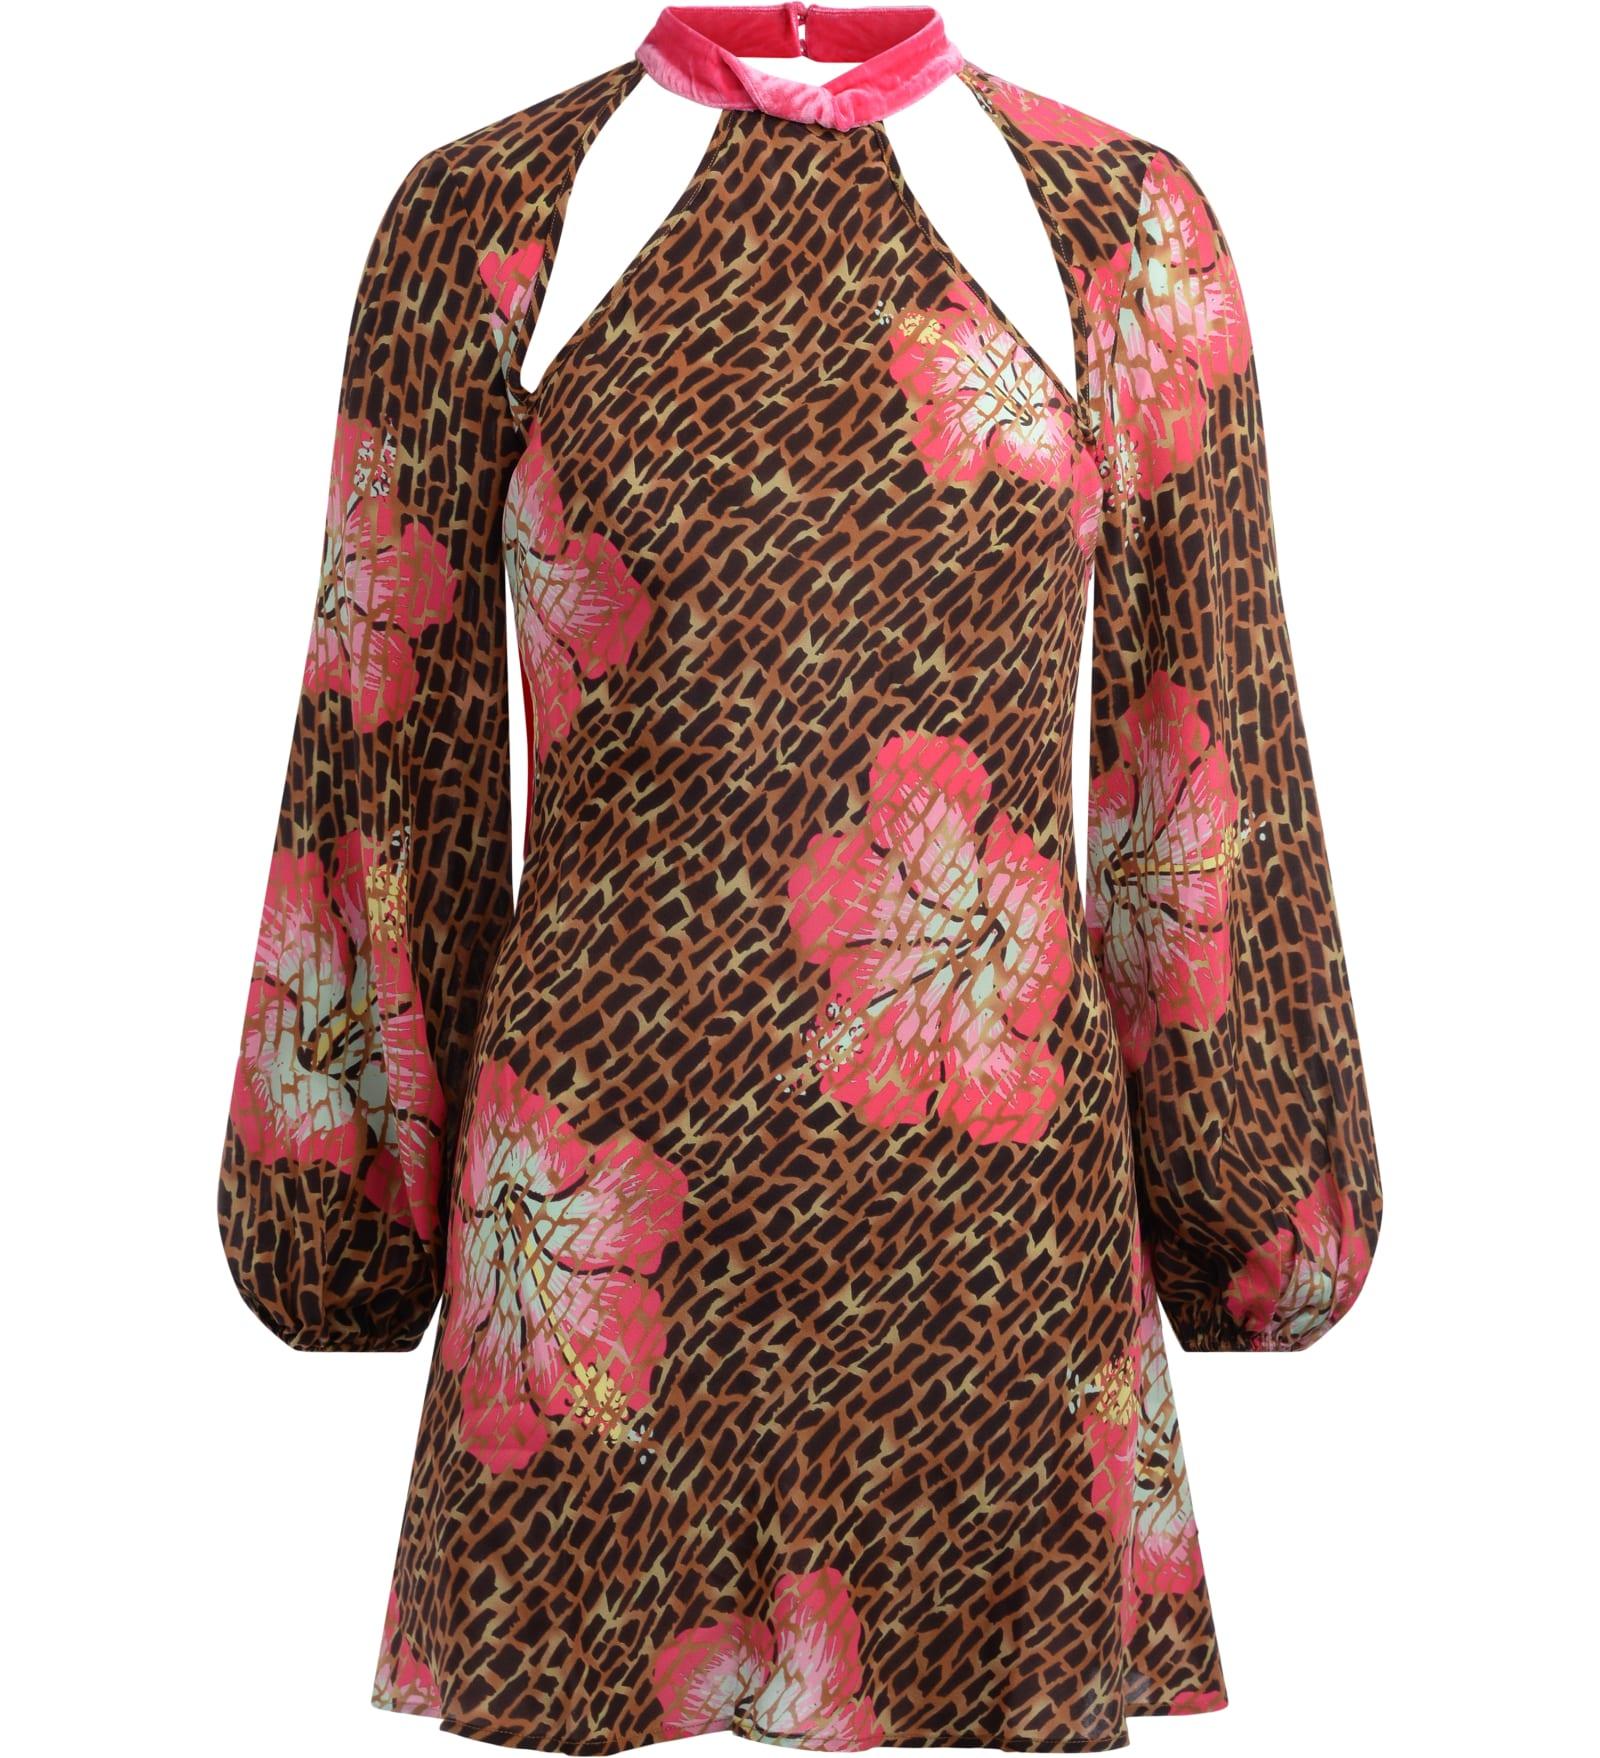 Buy Ralia Mini Dress Model Dalia In Hawaii Giraffe Print With Fuchsia Velvet Inserts online, shop RIXO with free shipping